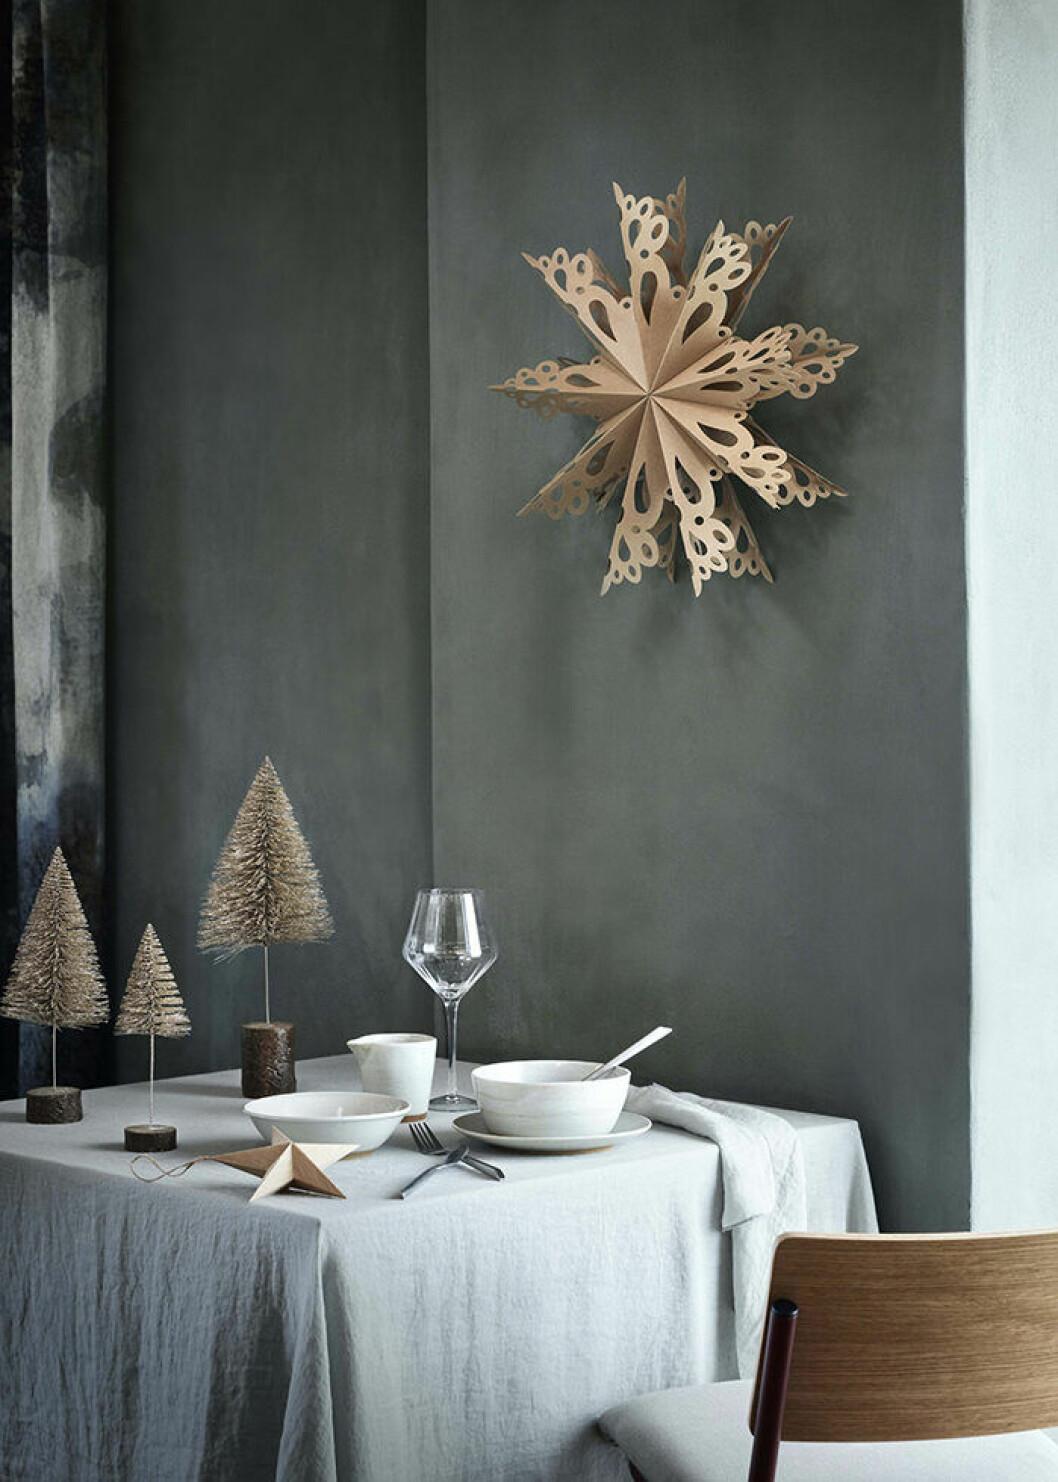 Nordisk designinspiration hos Broste Copenhagen i jul